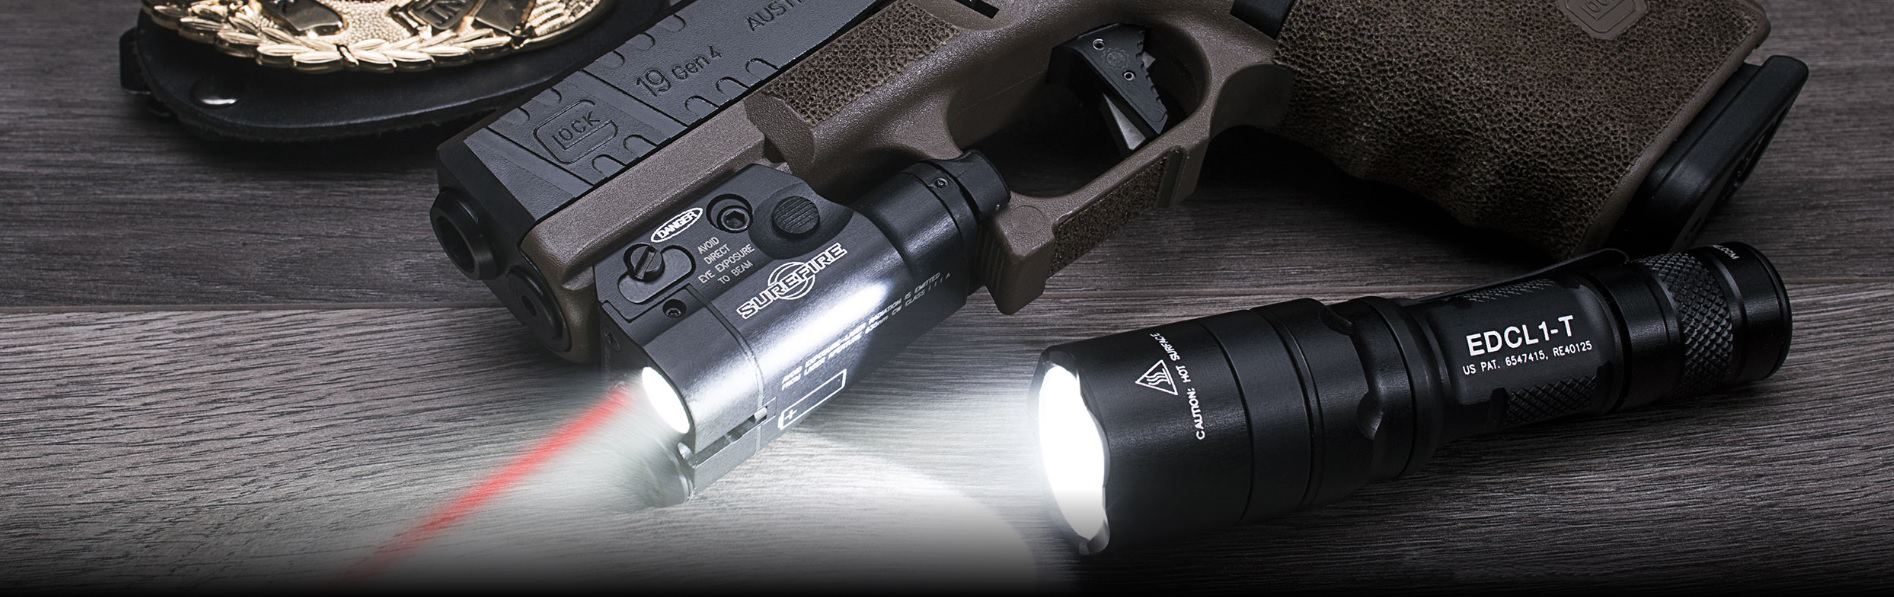 SUREFIRE-XC2-A-Ultra-Compact-LED-Handgun-Light-and-Laser-Sight-GLOCK-BANNER